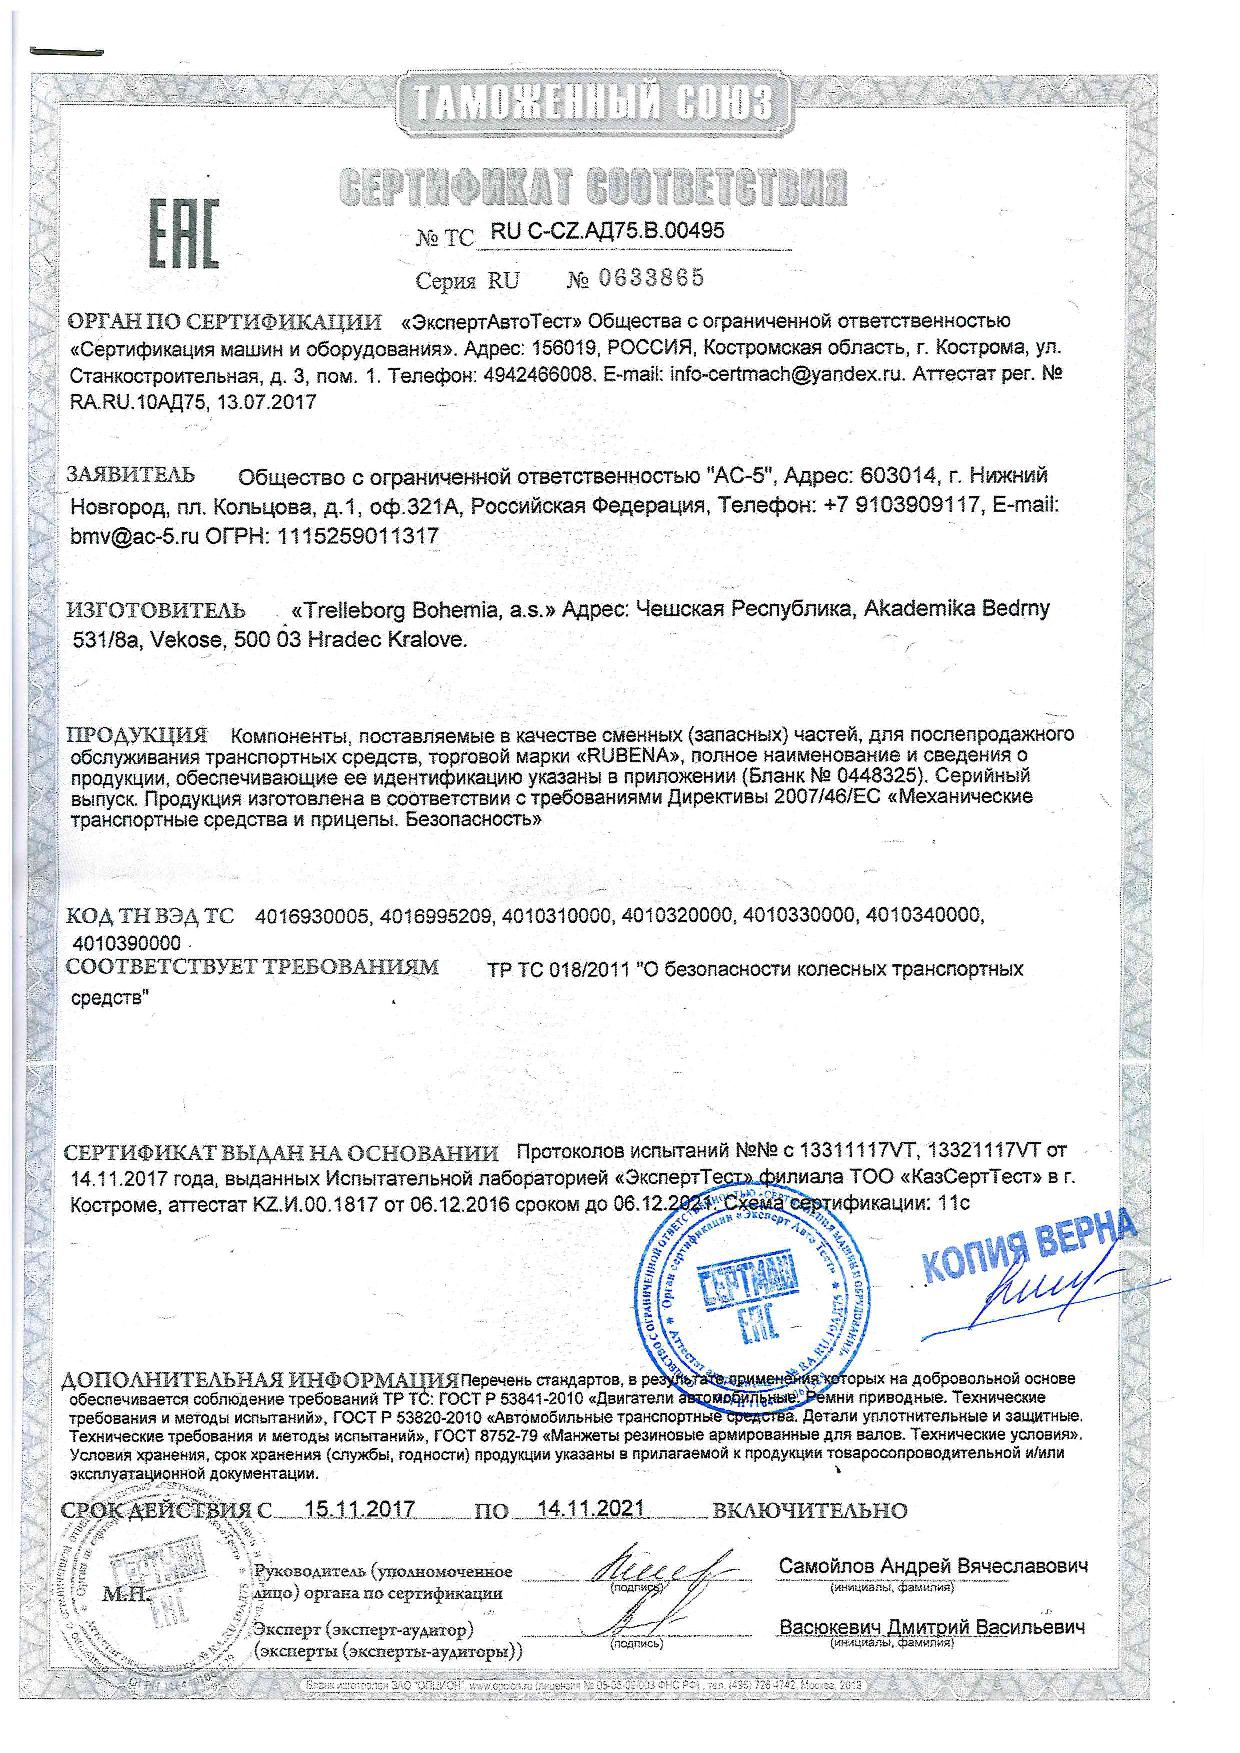 Сертификат Rubena стр. 1 до 14.11.21